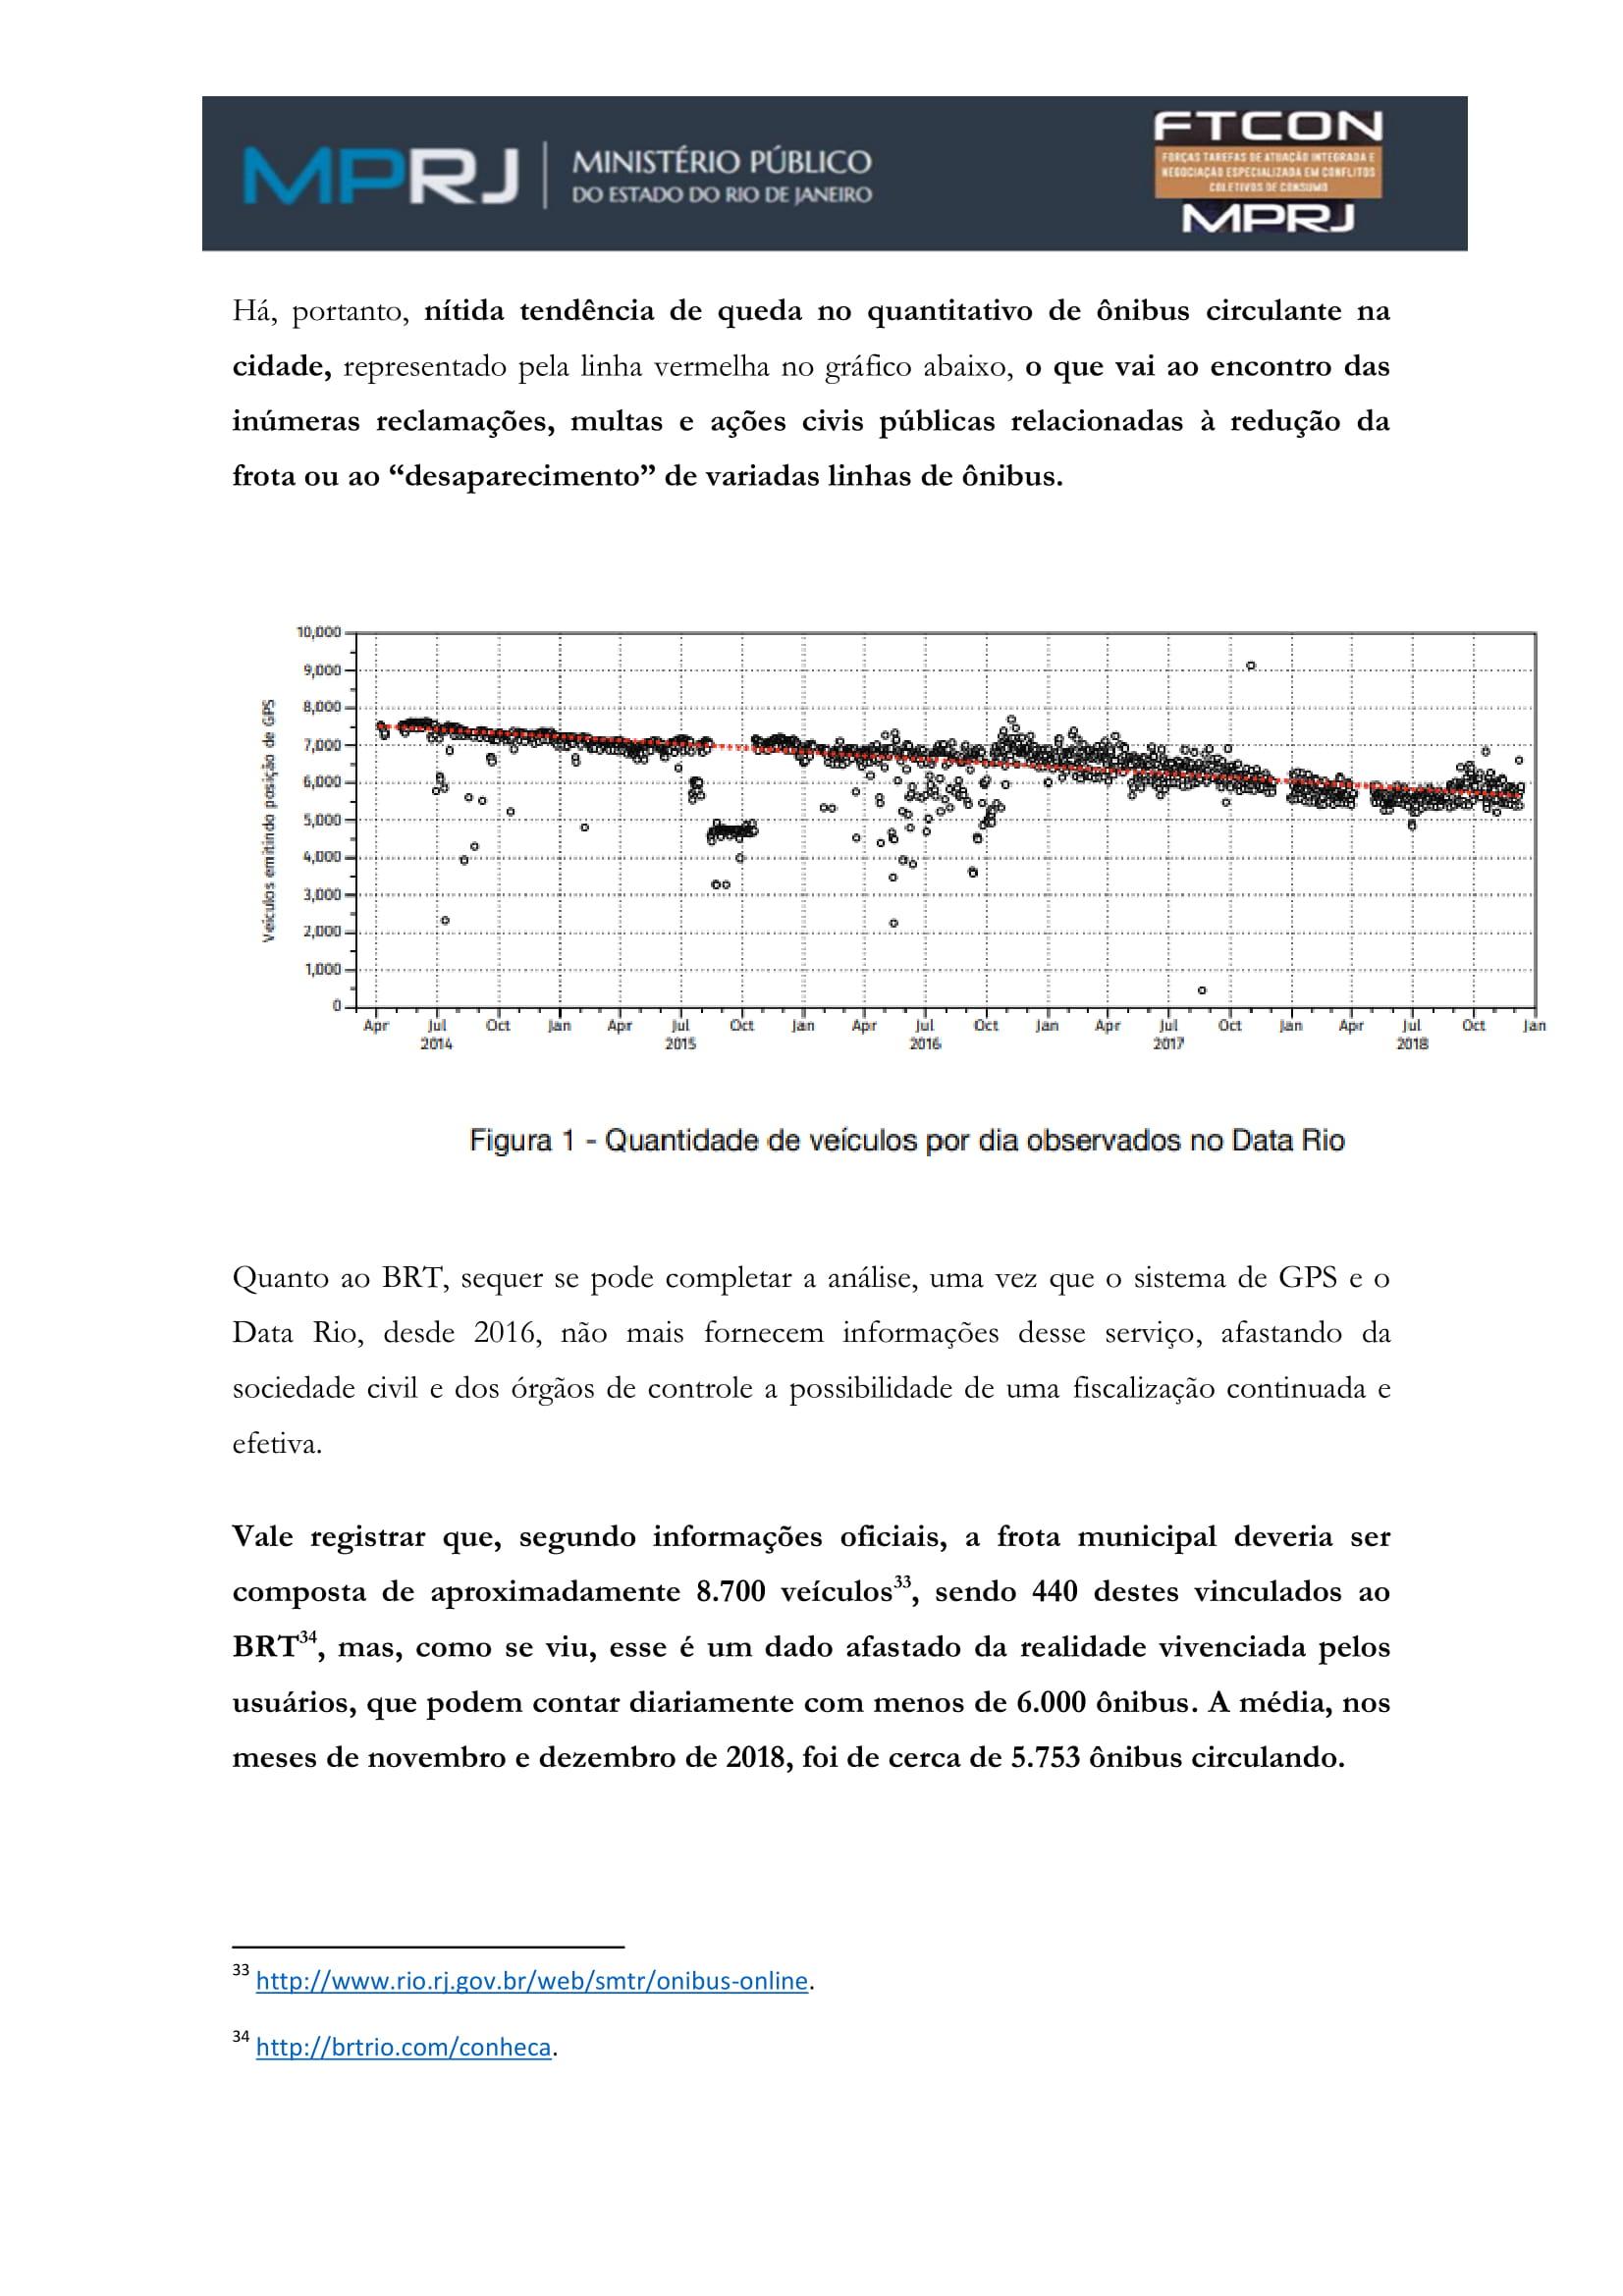 acp_caducidade_onibus_dr_rt-032